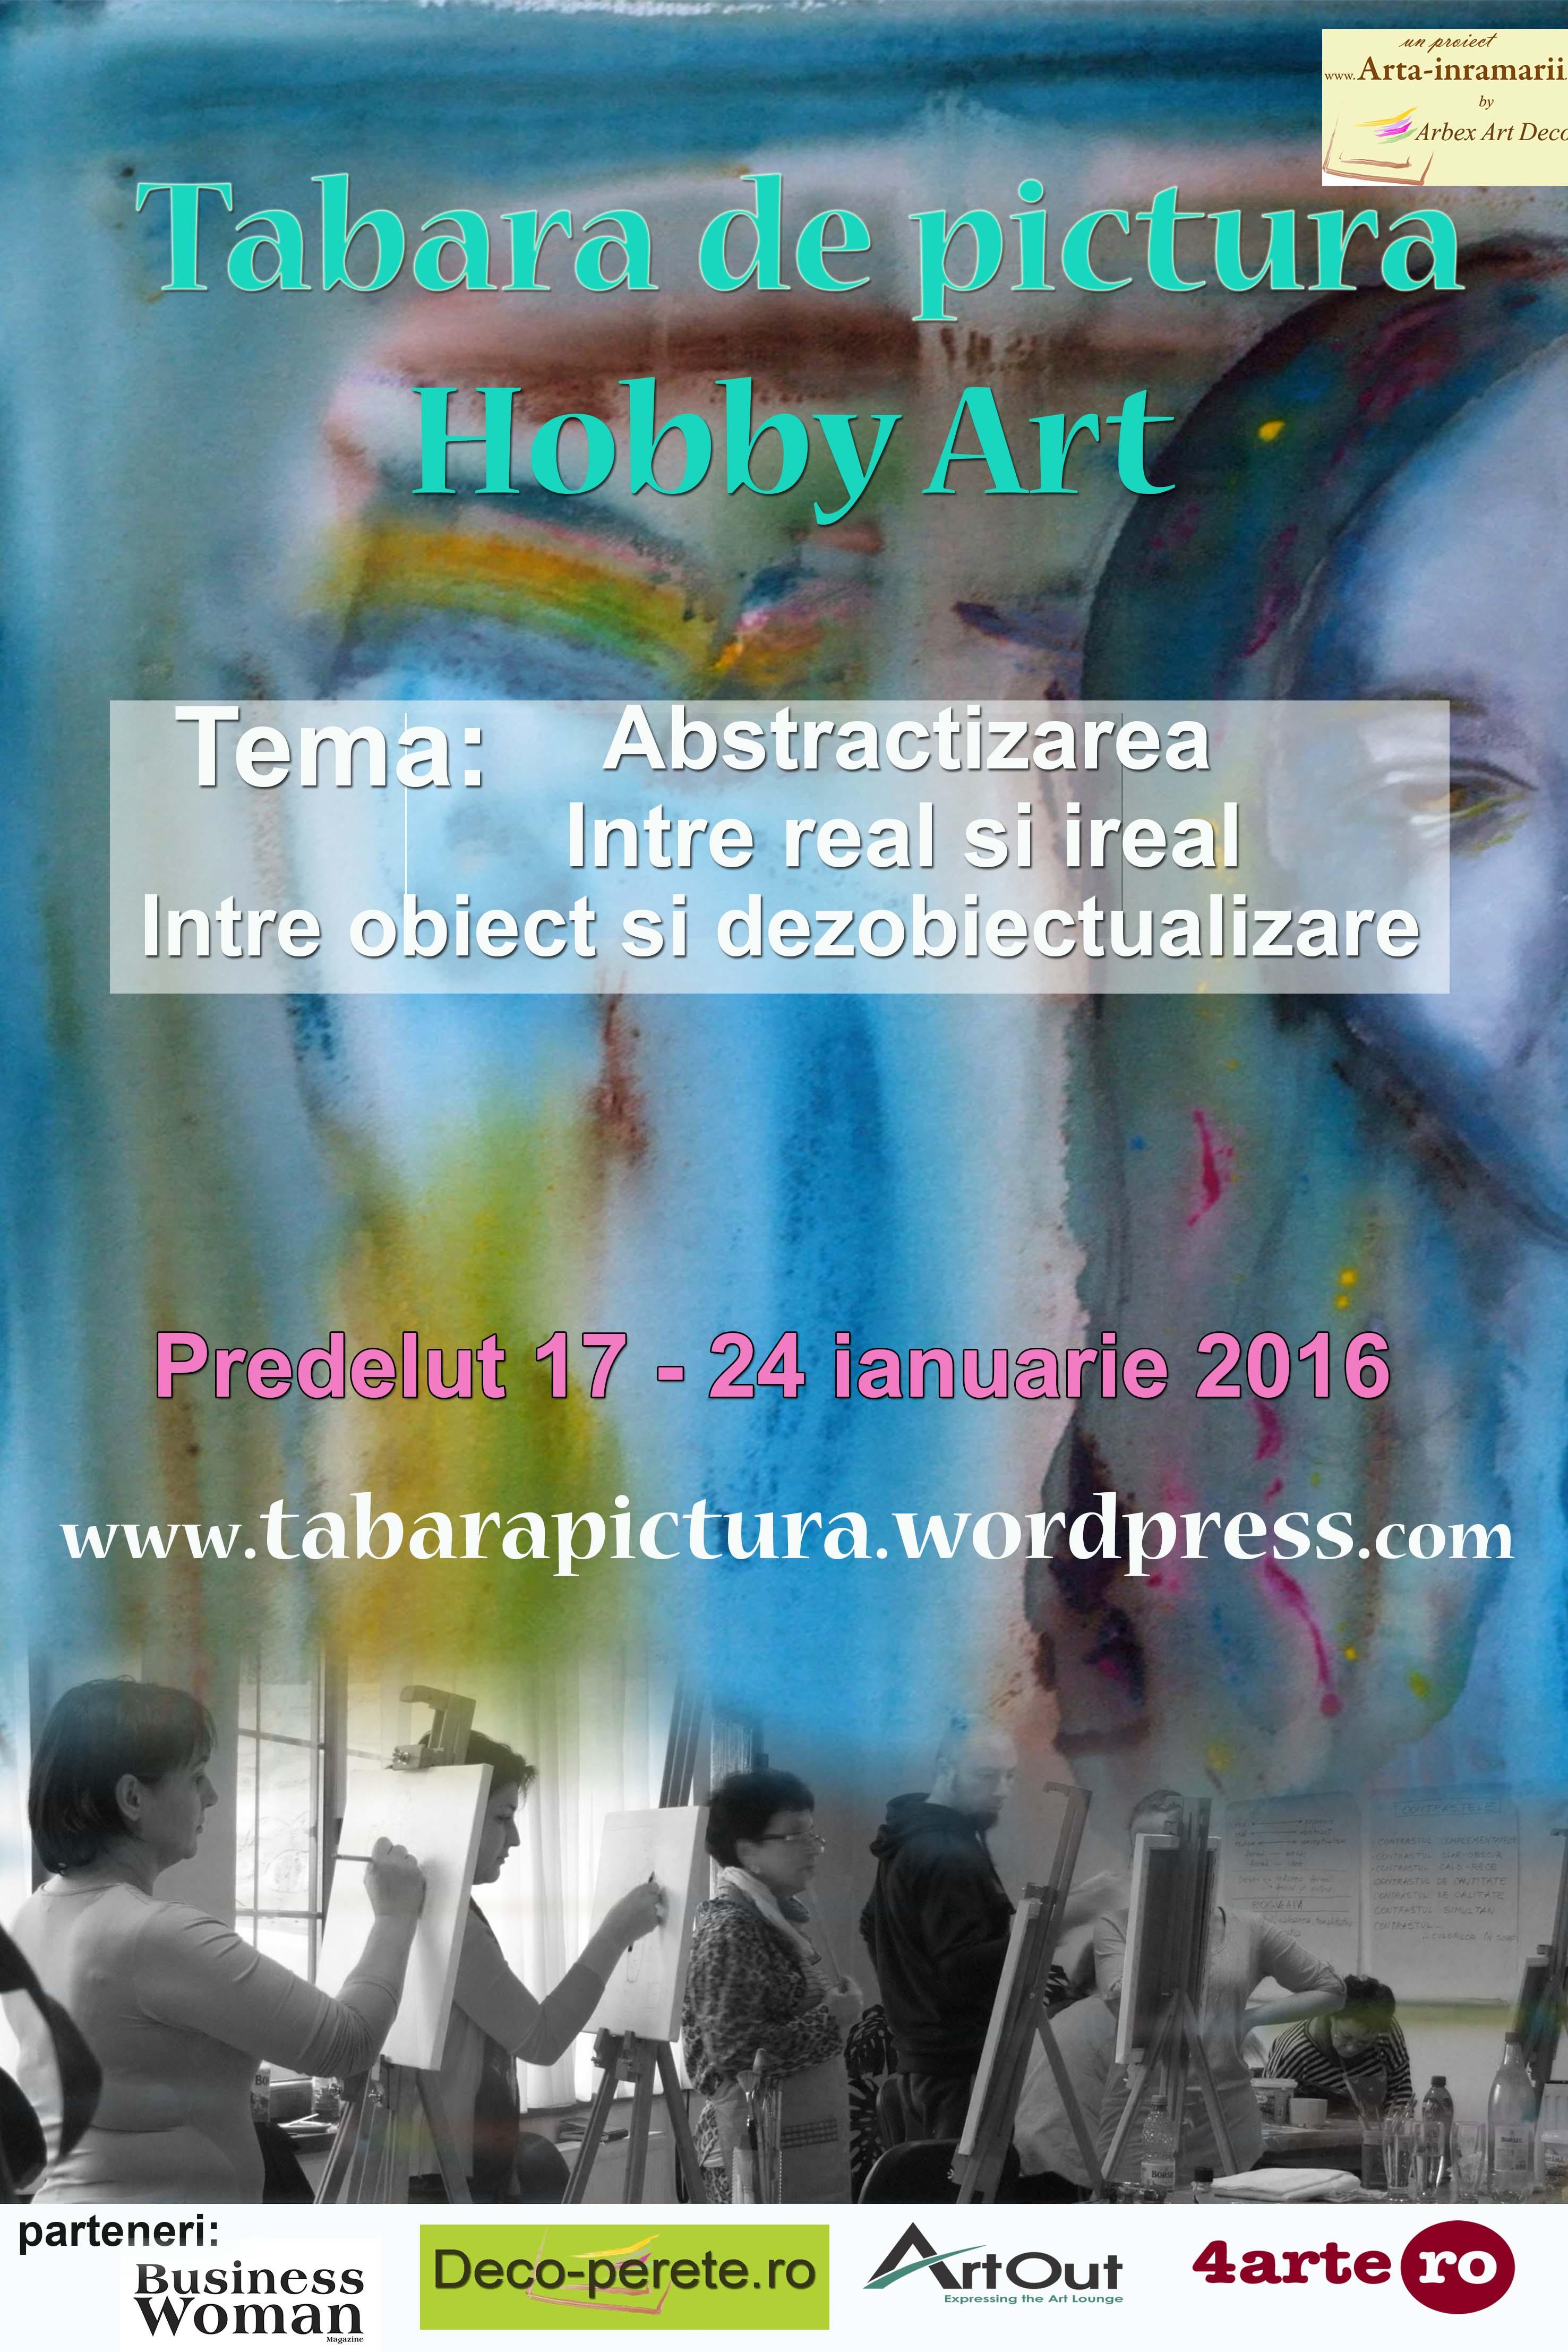 afisul Taberei de pictura Hobby Art editia de iarna 2016